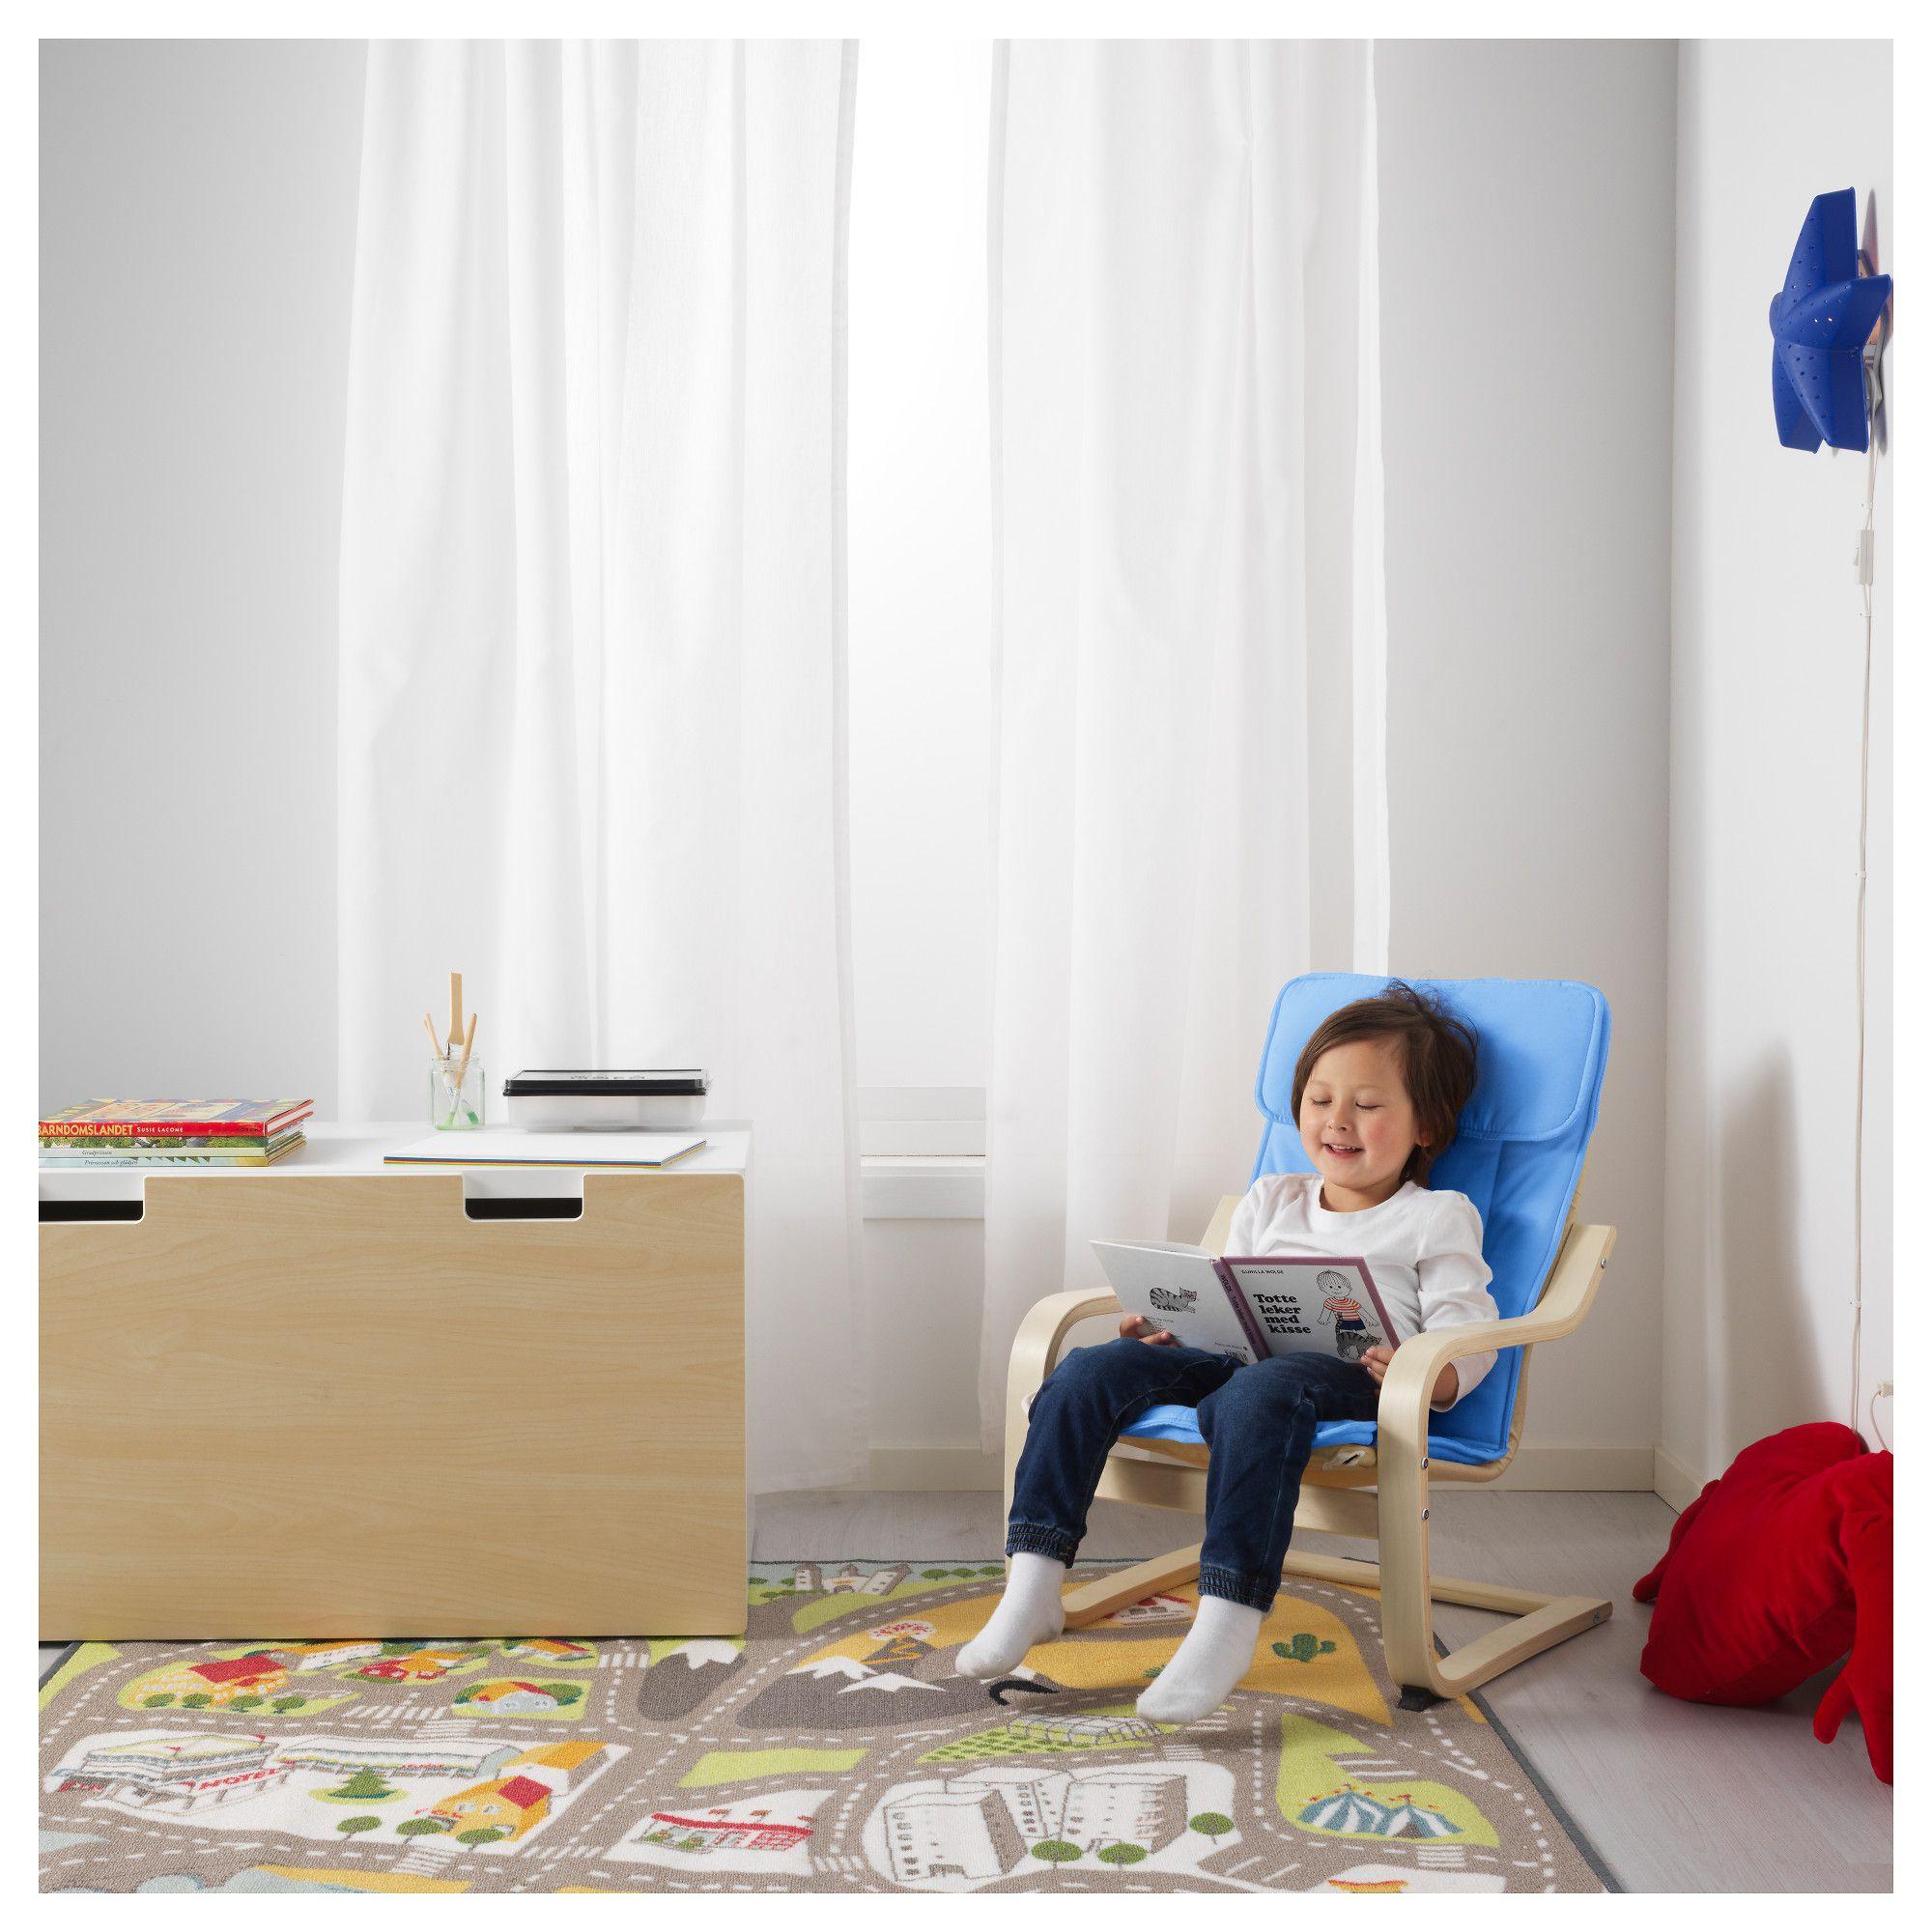 Furniture and Home Furnishings   Ikea armchair, Ikea kids